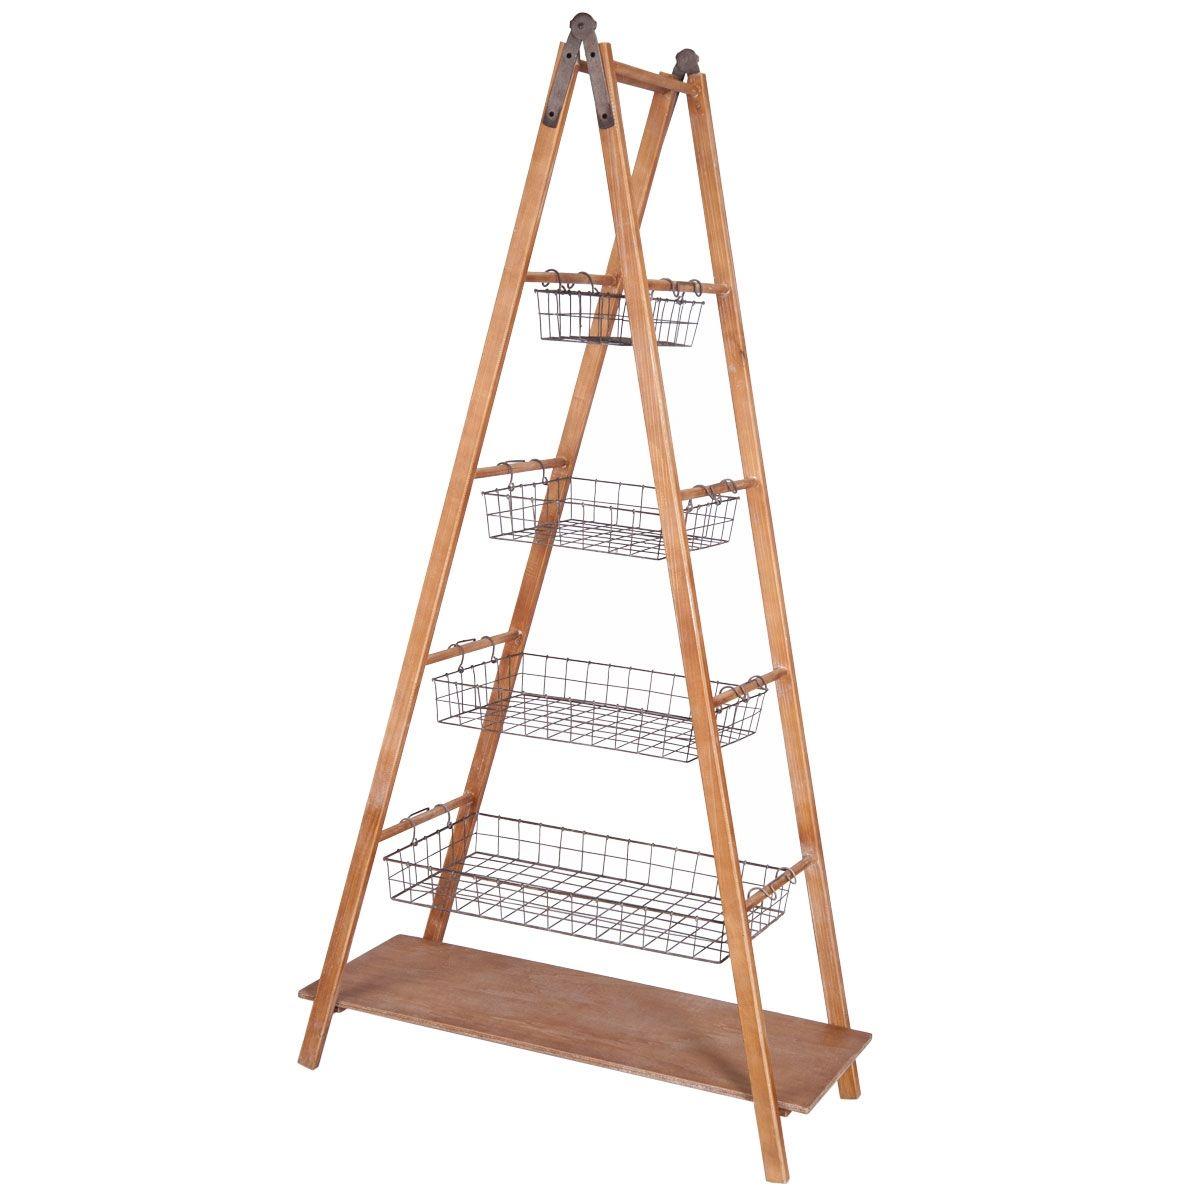 Foreside Home & Garden - Ladder Basket Shelf | Trend Alert : Wood + ...